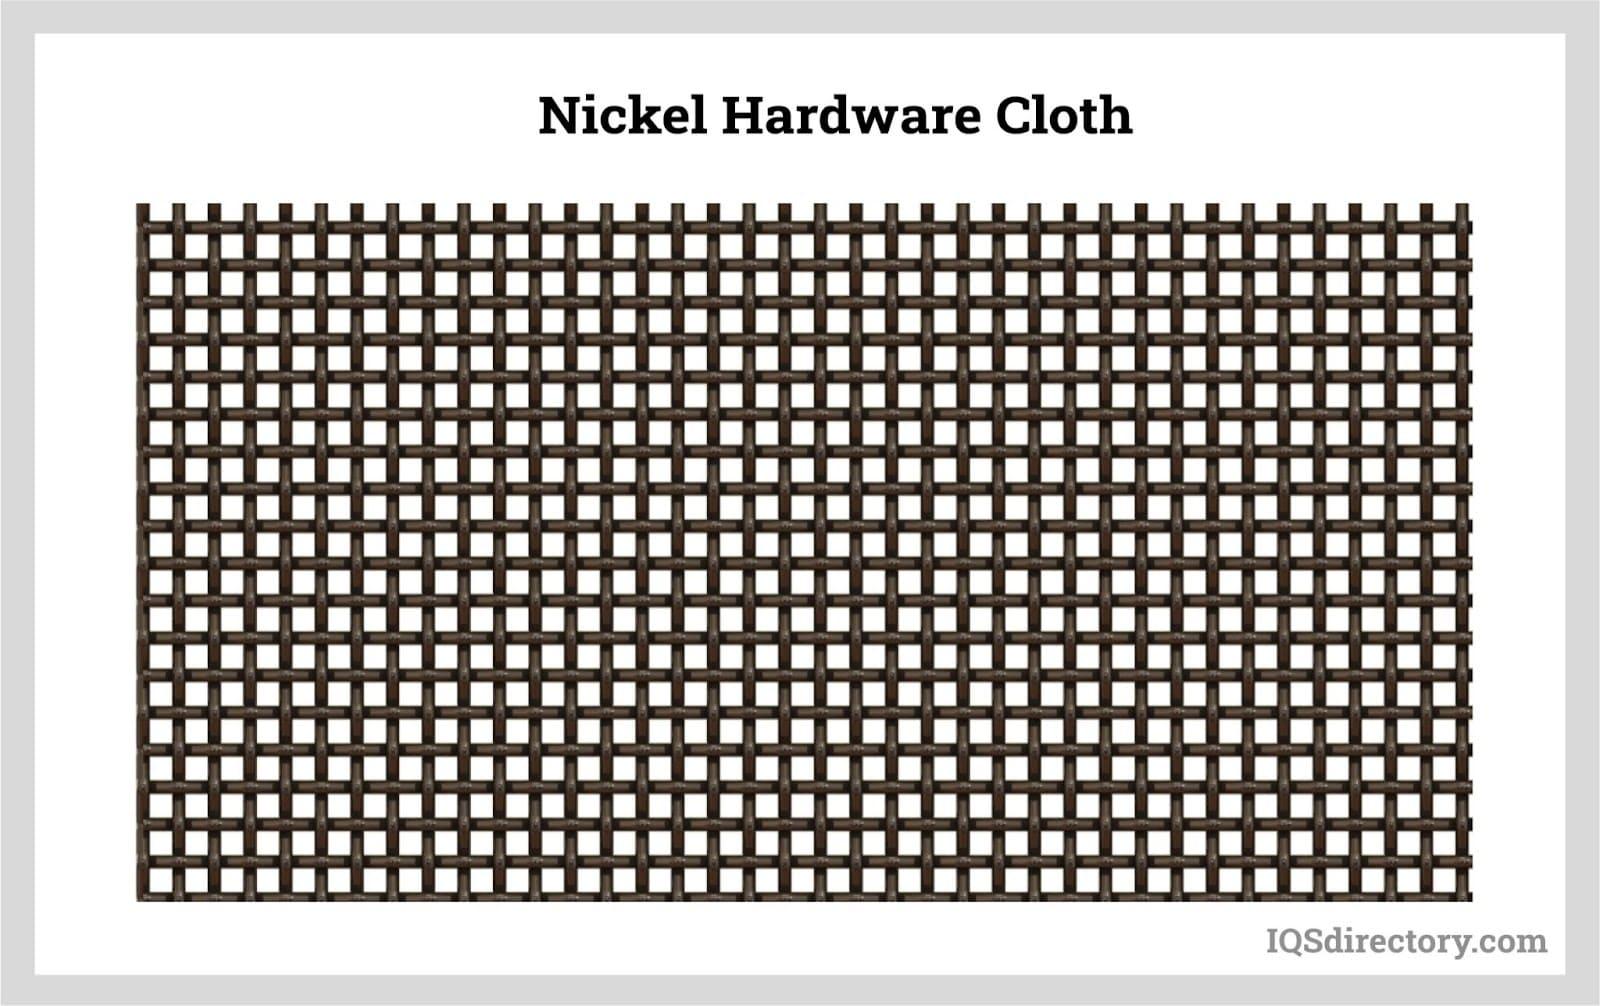 Nickel Hardware Cloth